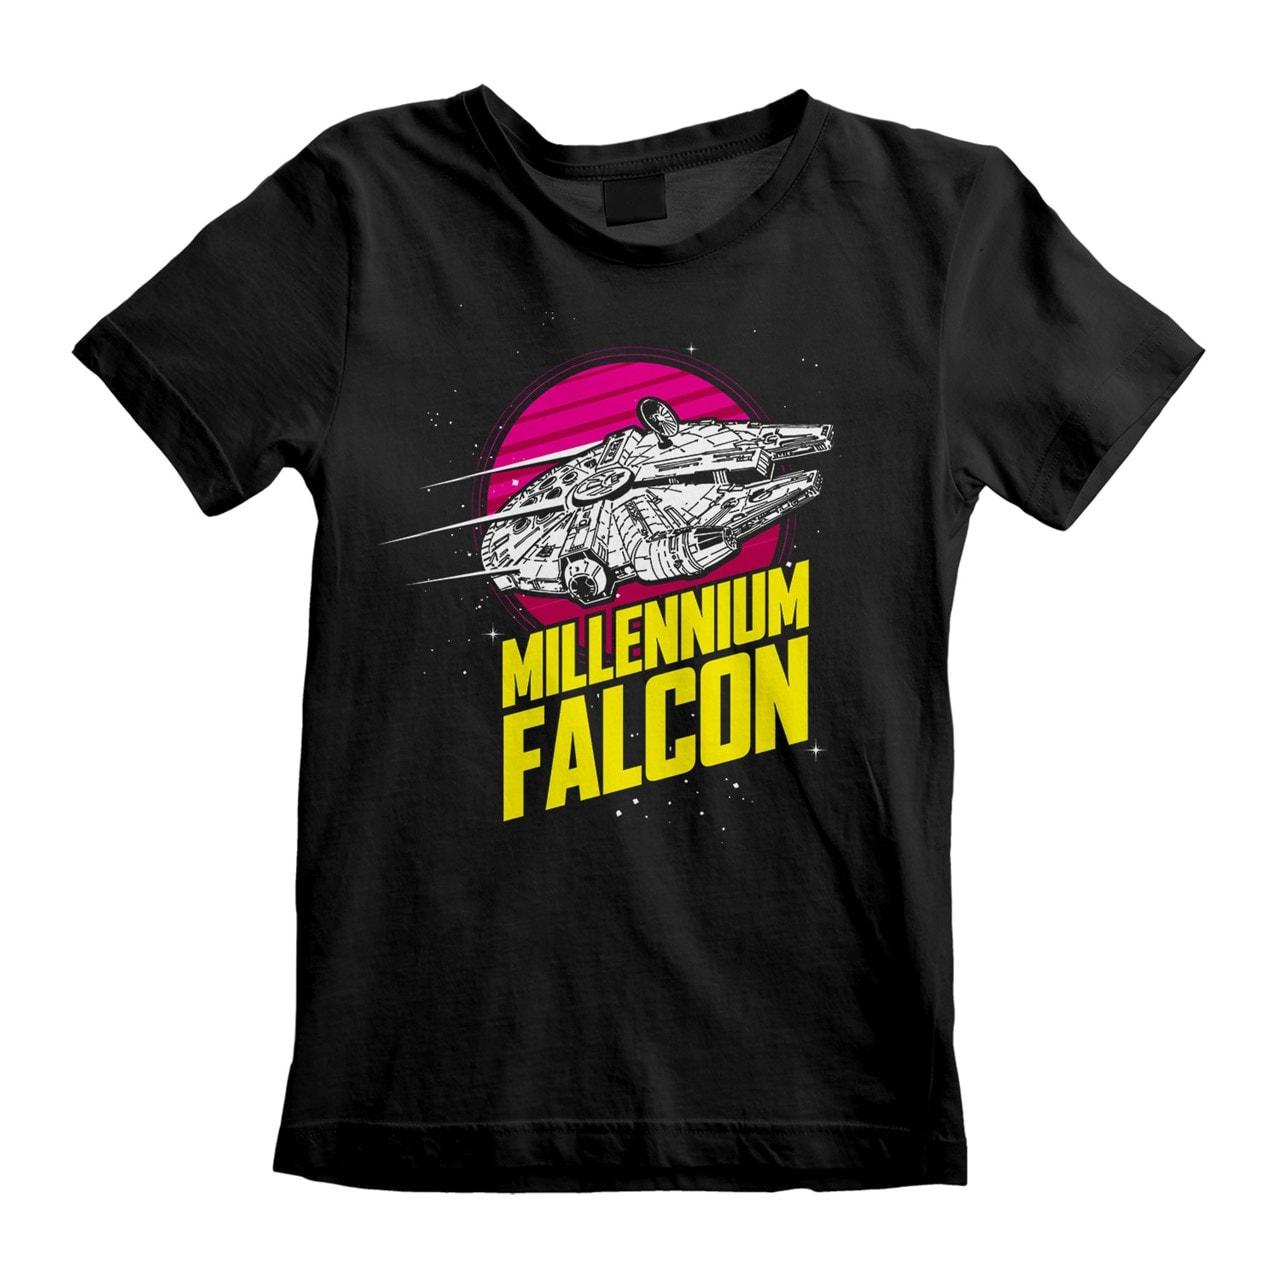 Star Wars: Millenium Falcon (Kids Tee) (3-4YR) - 1